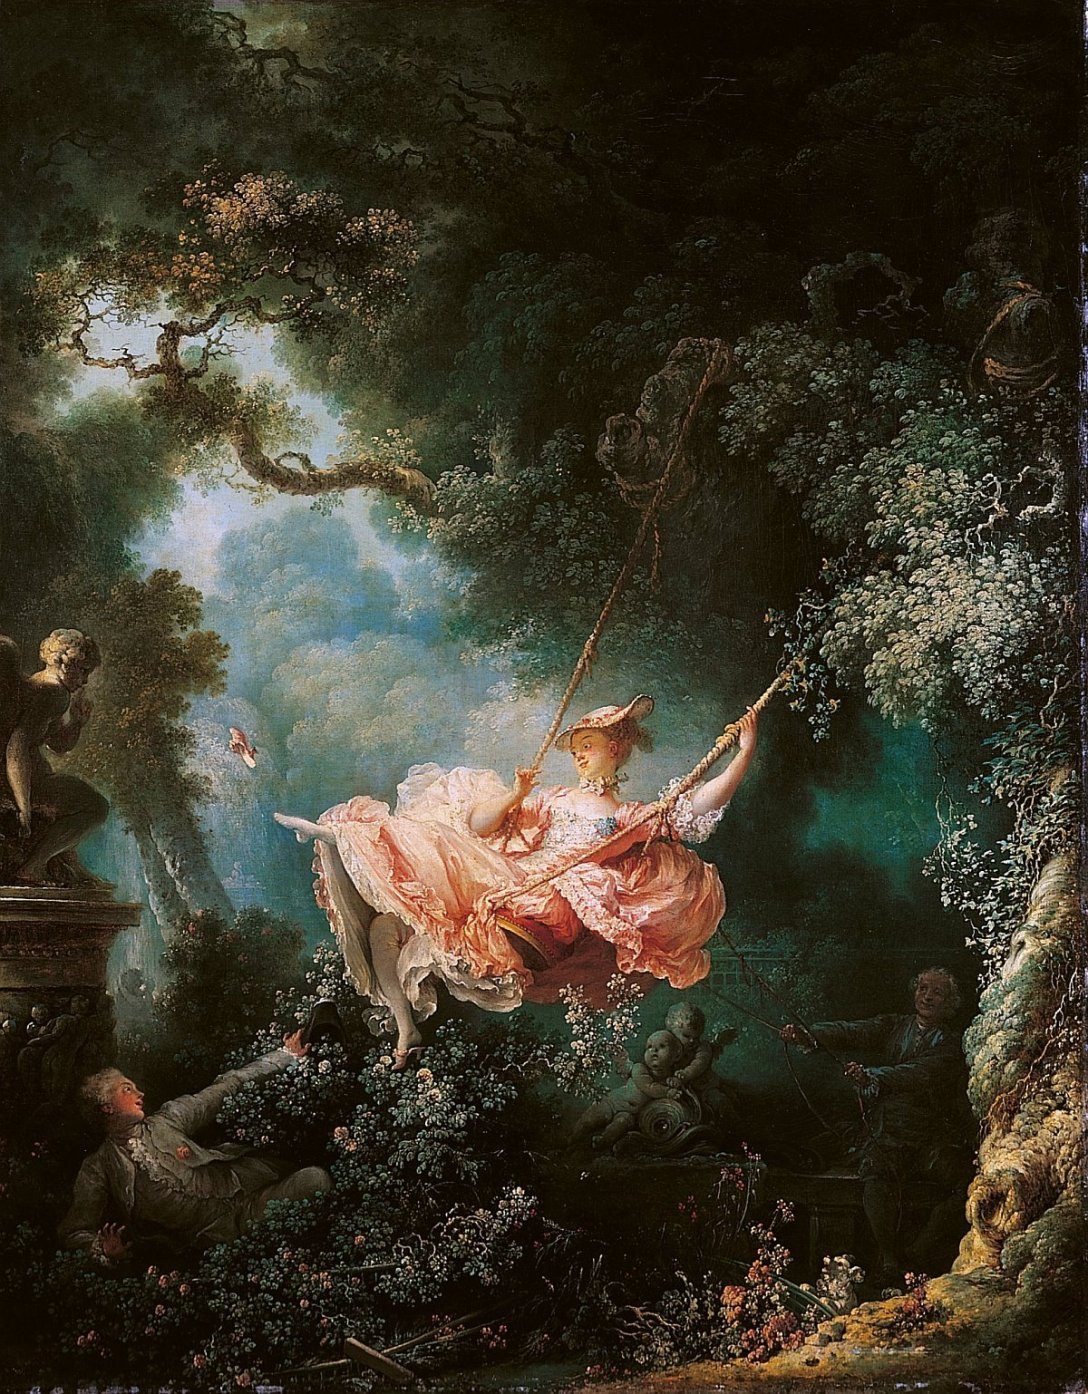 """Huśtawka"", Jean-Honoré Fragonard, 1767-1778"